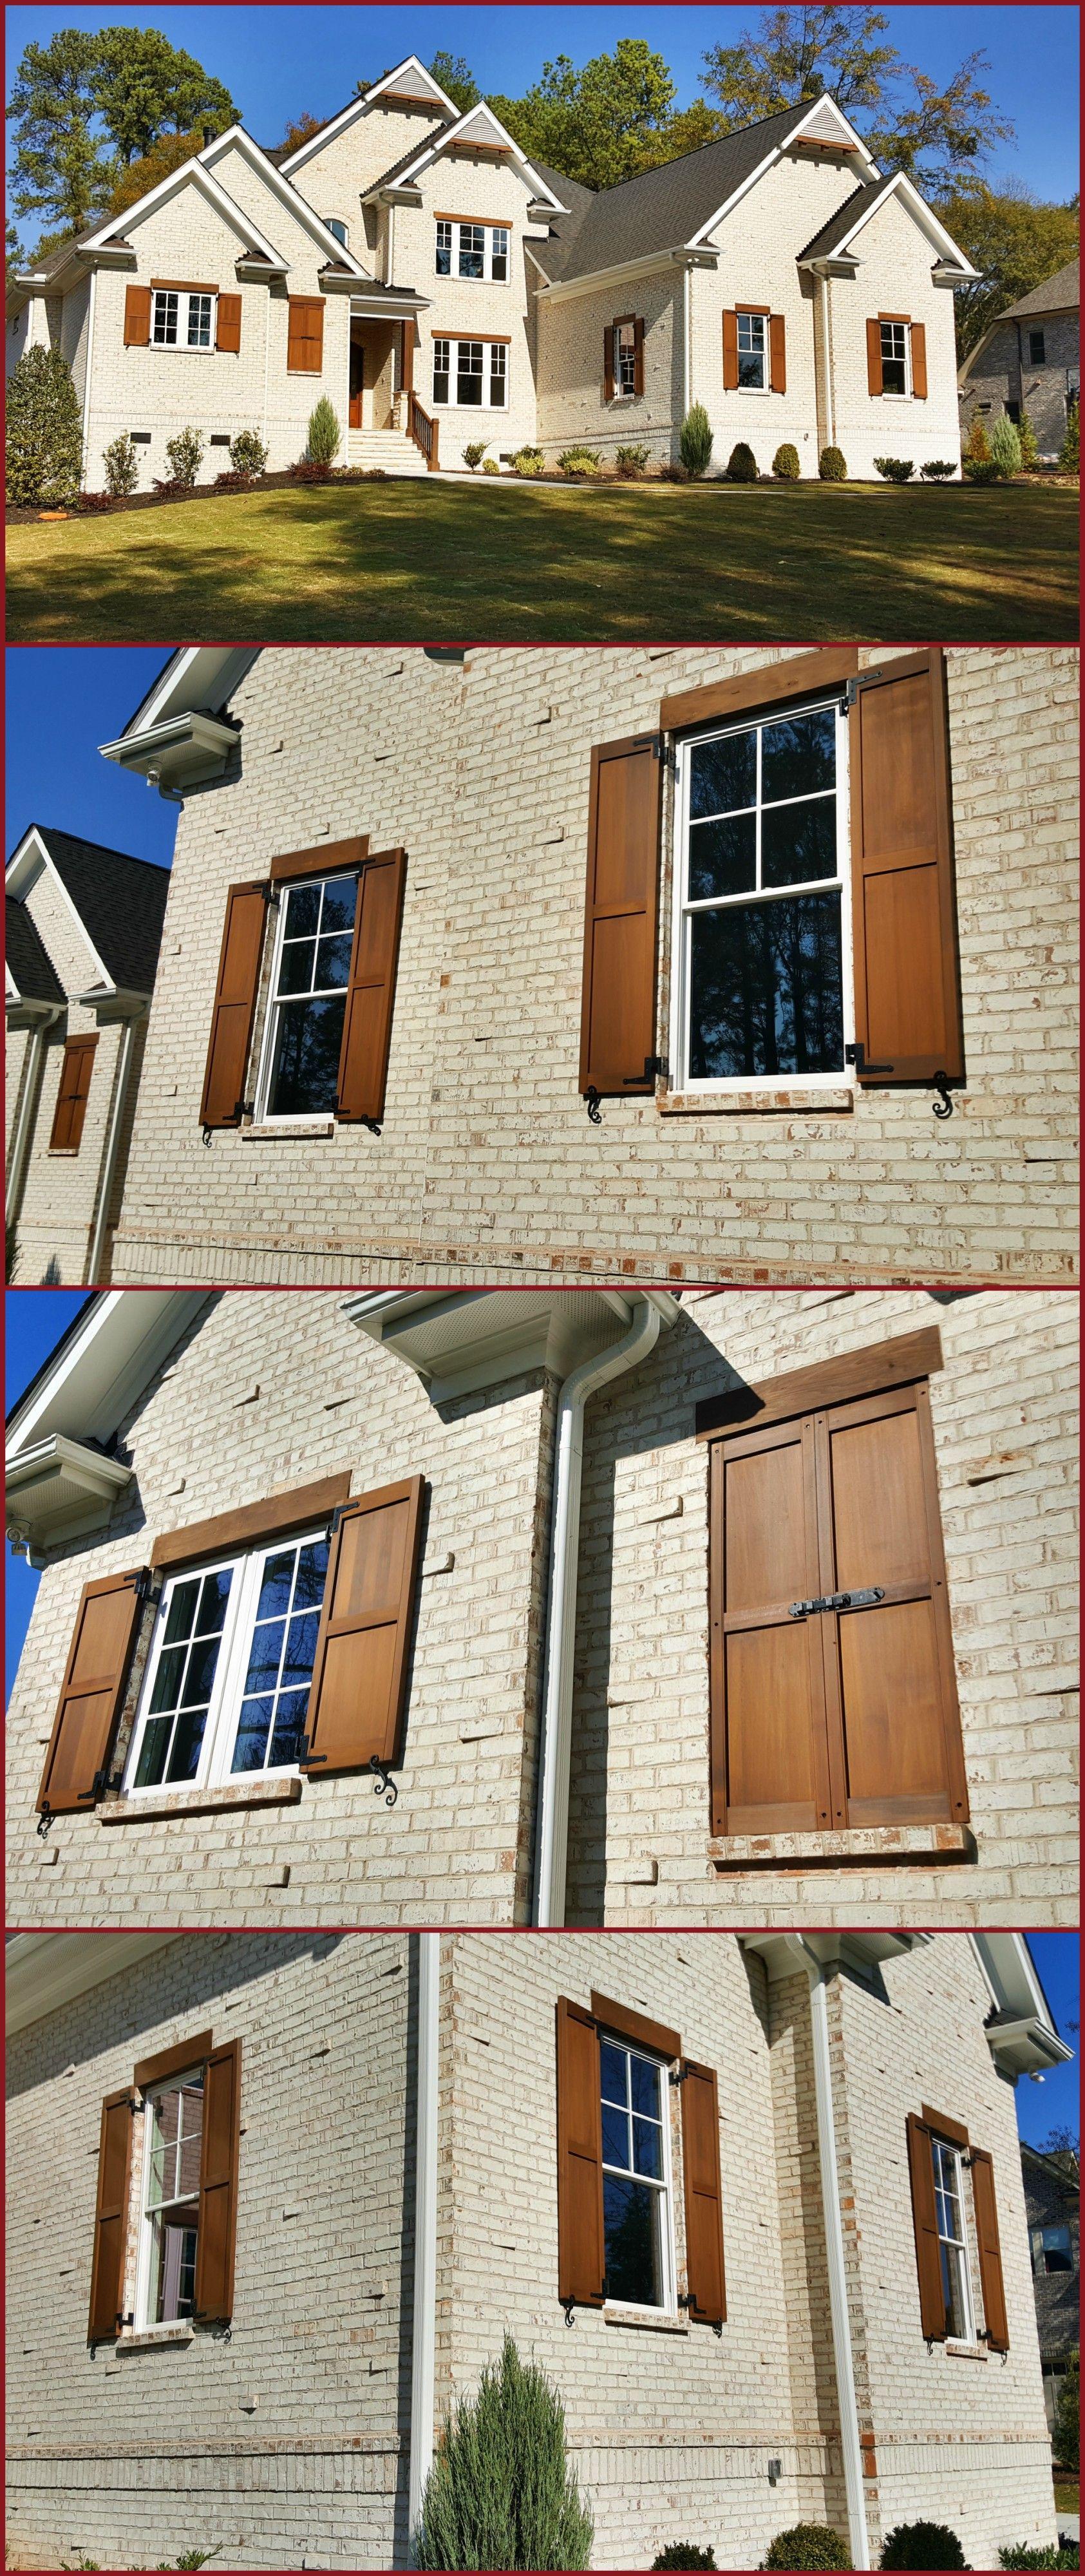 White House With Cedar Shutters : white, house, cedar, shutters, Custom, Built, Stained, Exterior, Cedar, Shutters, White, Brick, House, House,, Paint, Exterior,